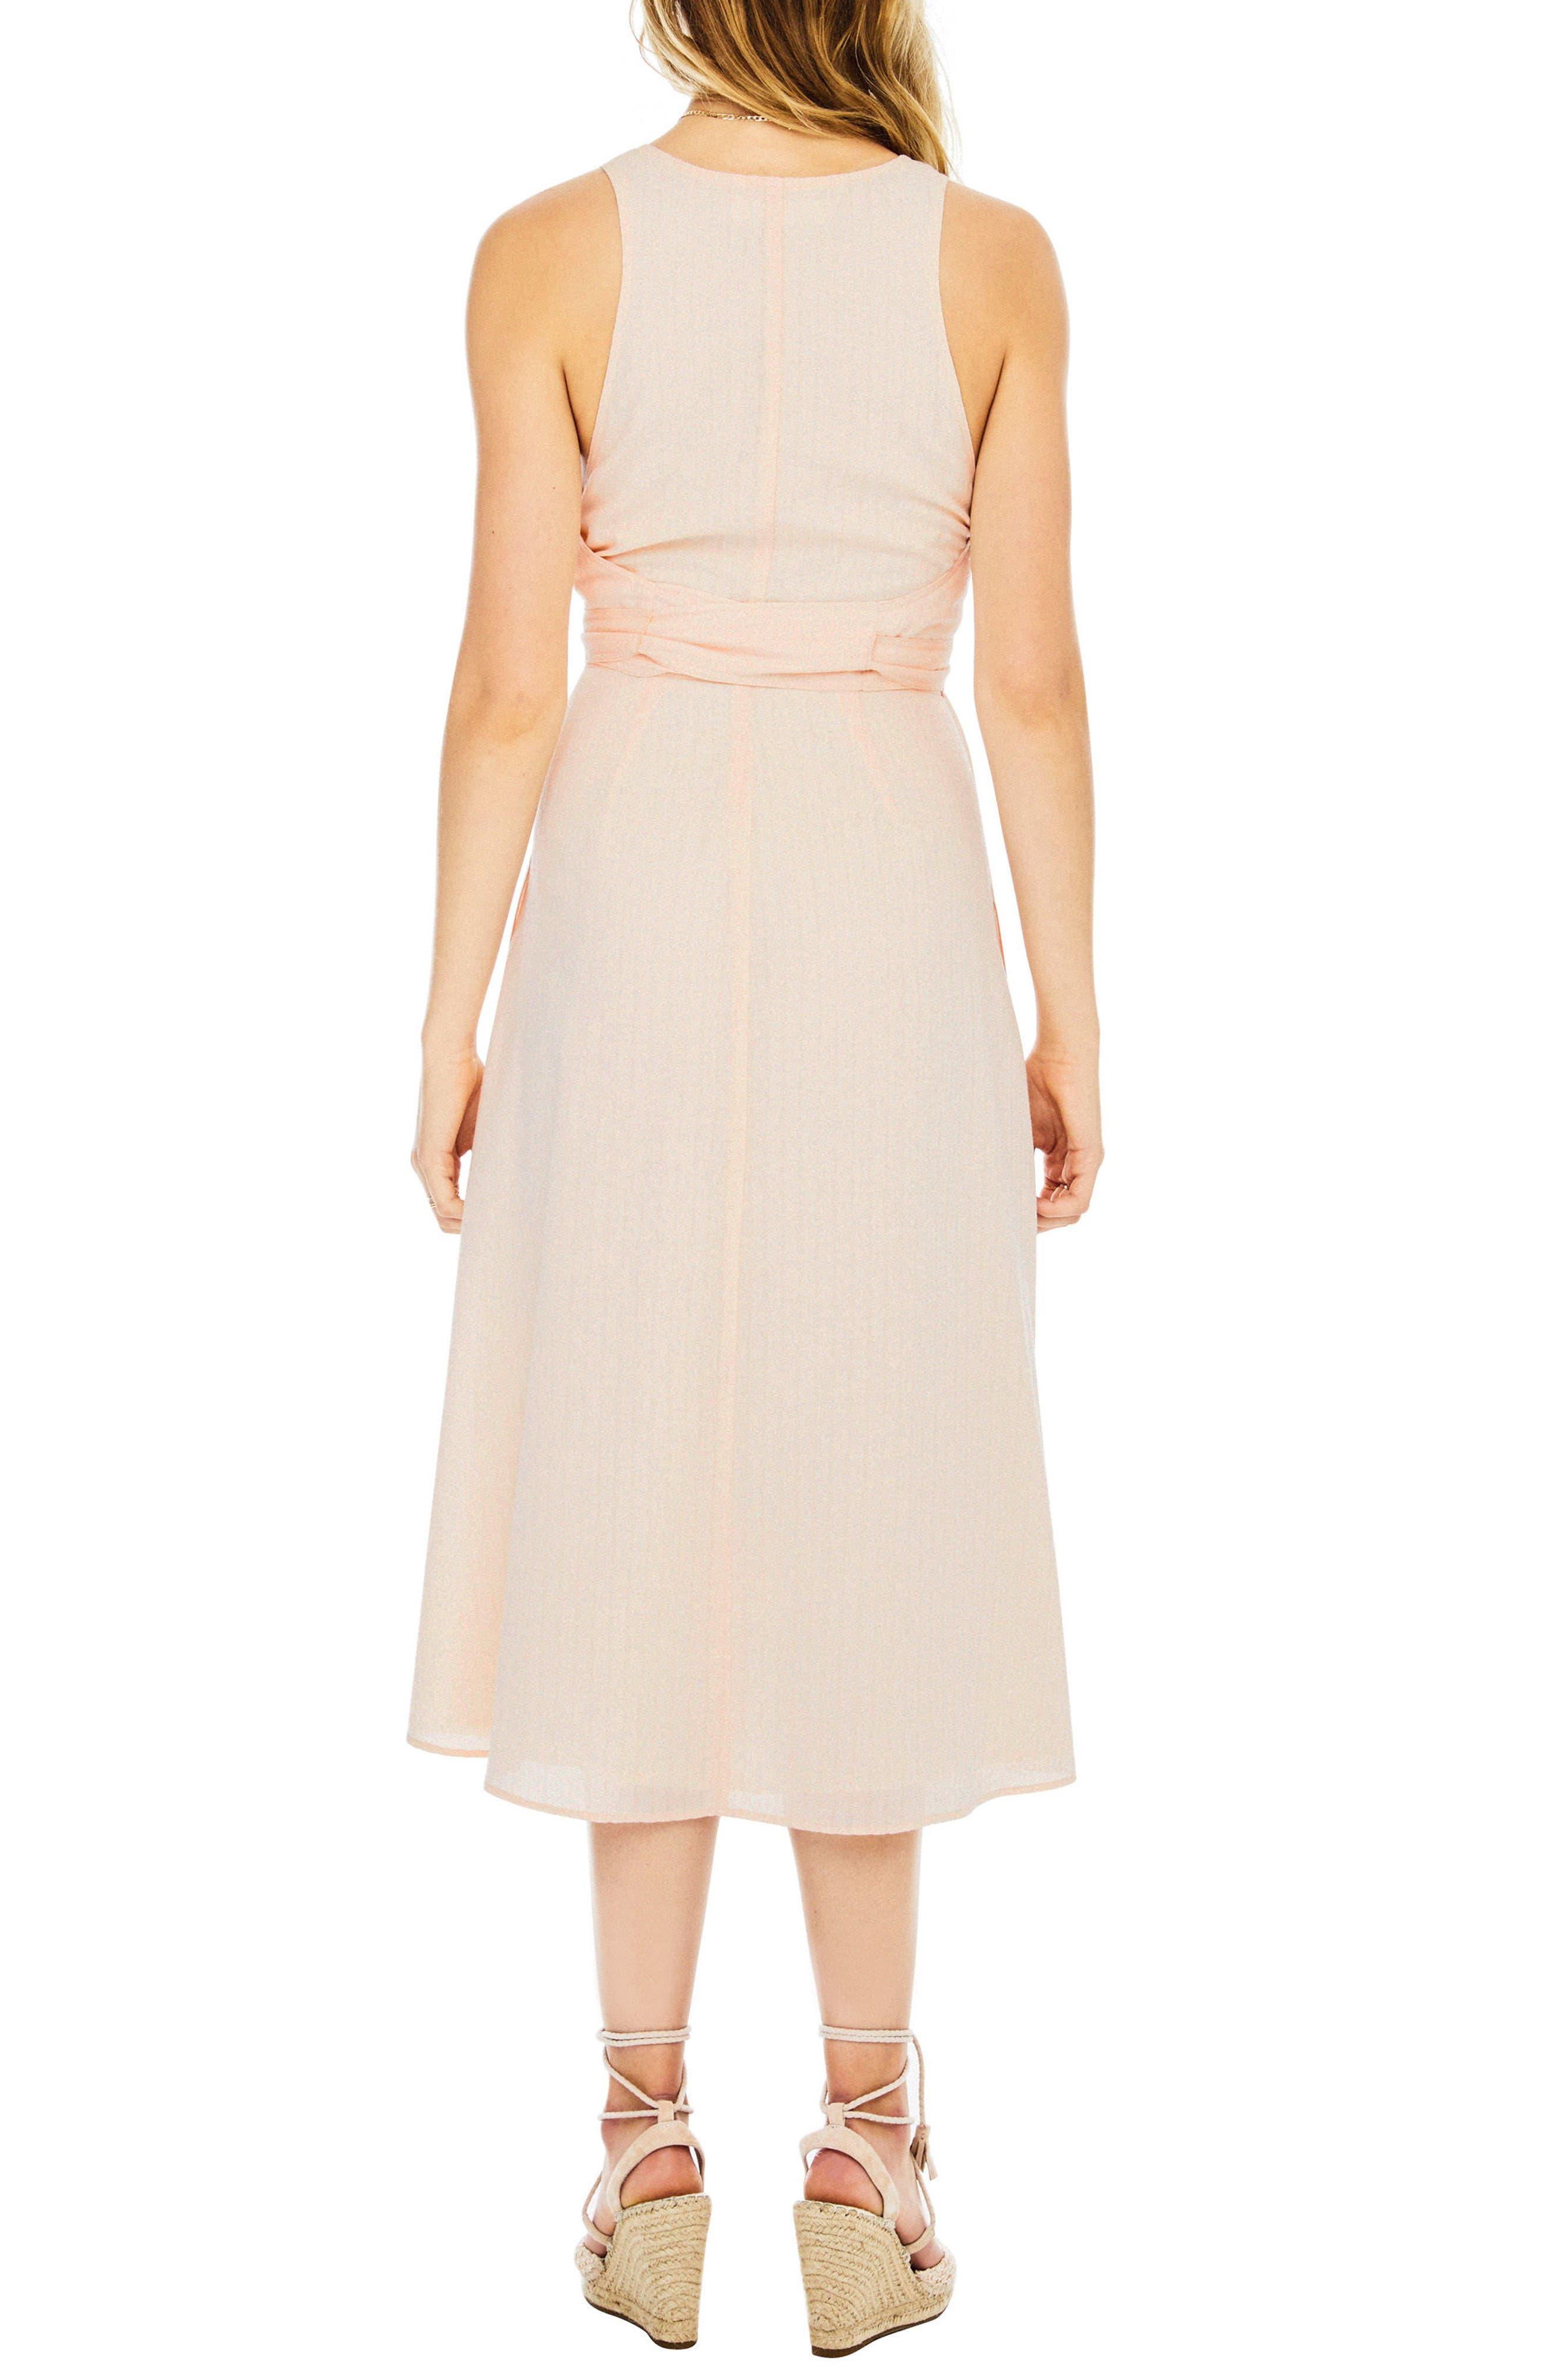 Brady Dress,                             Alternate thumbnail 2, color,                             668